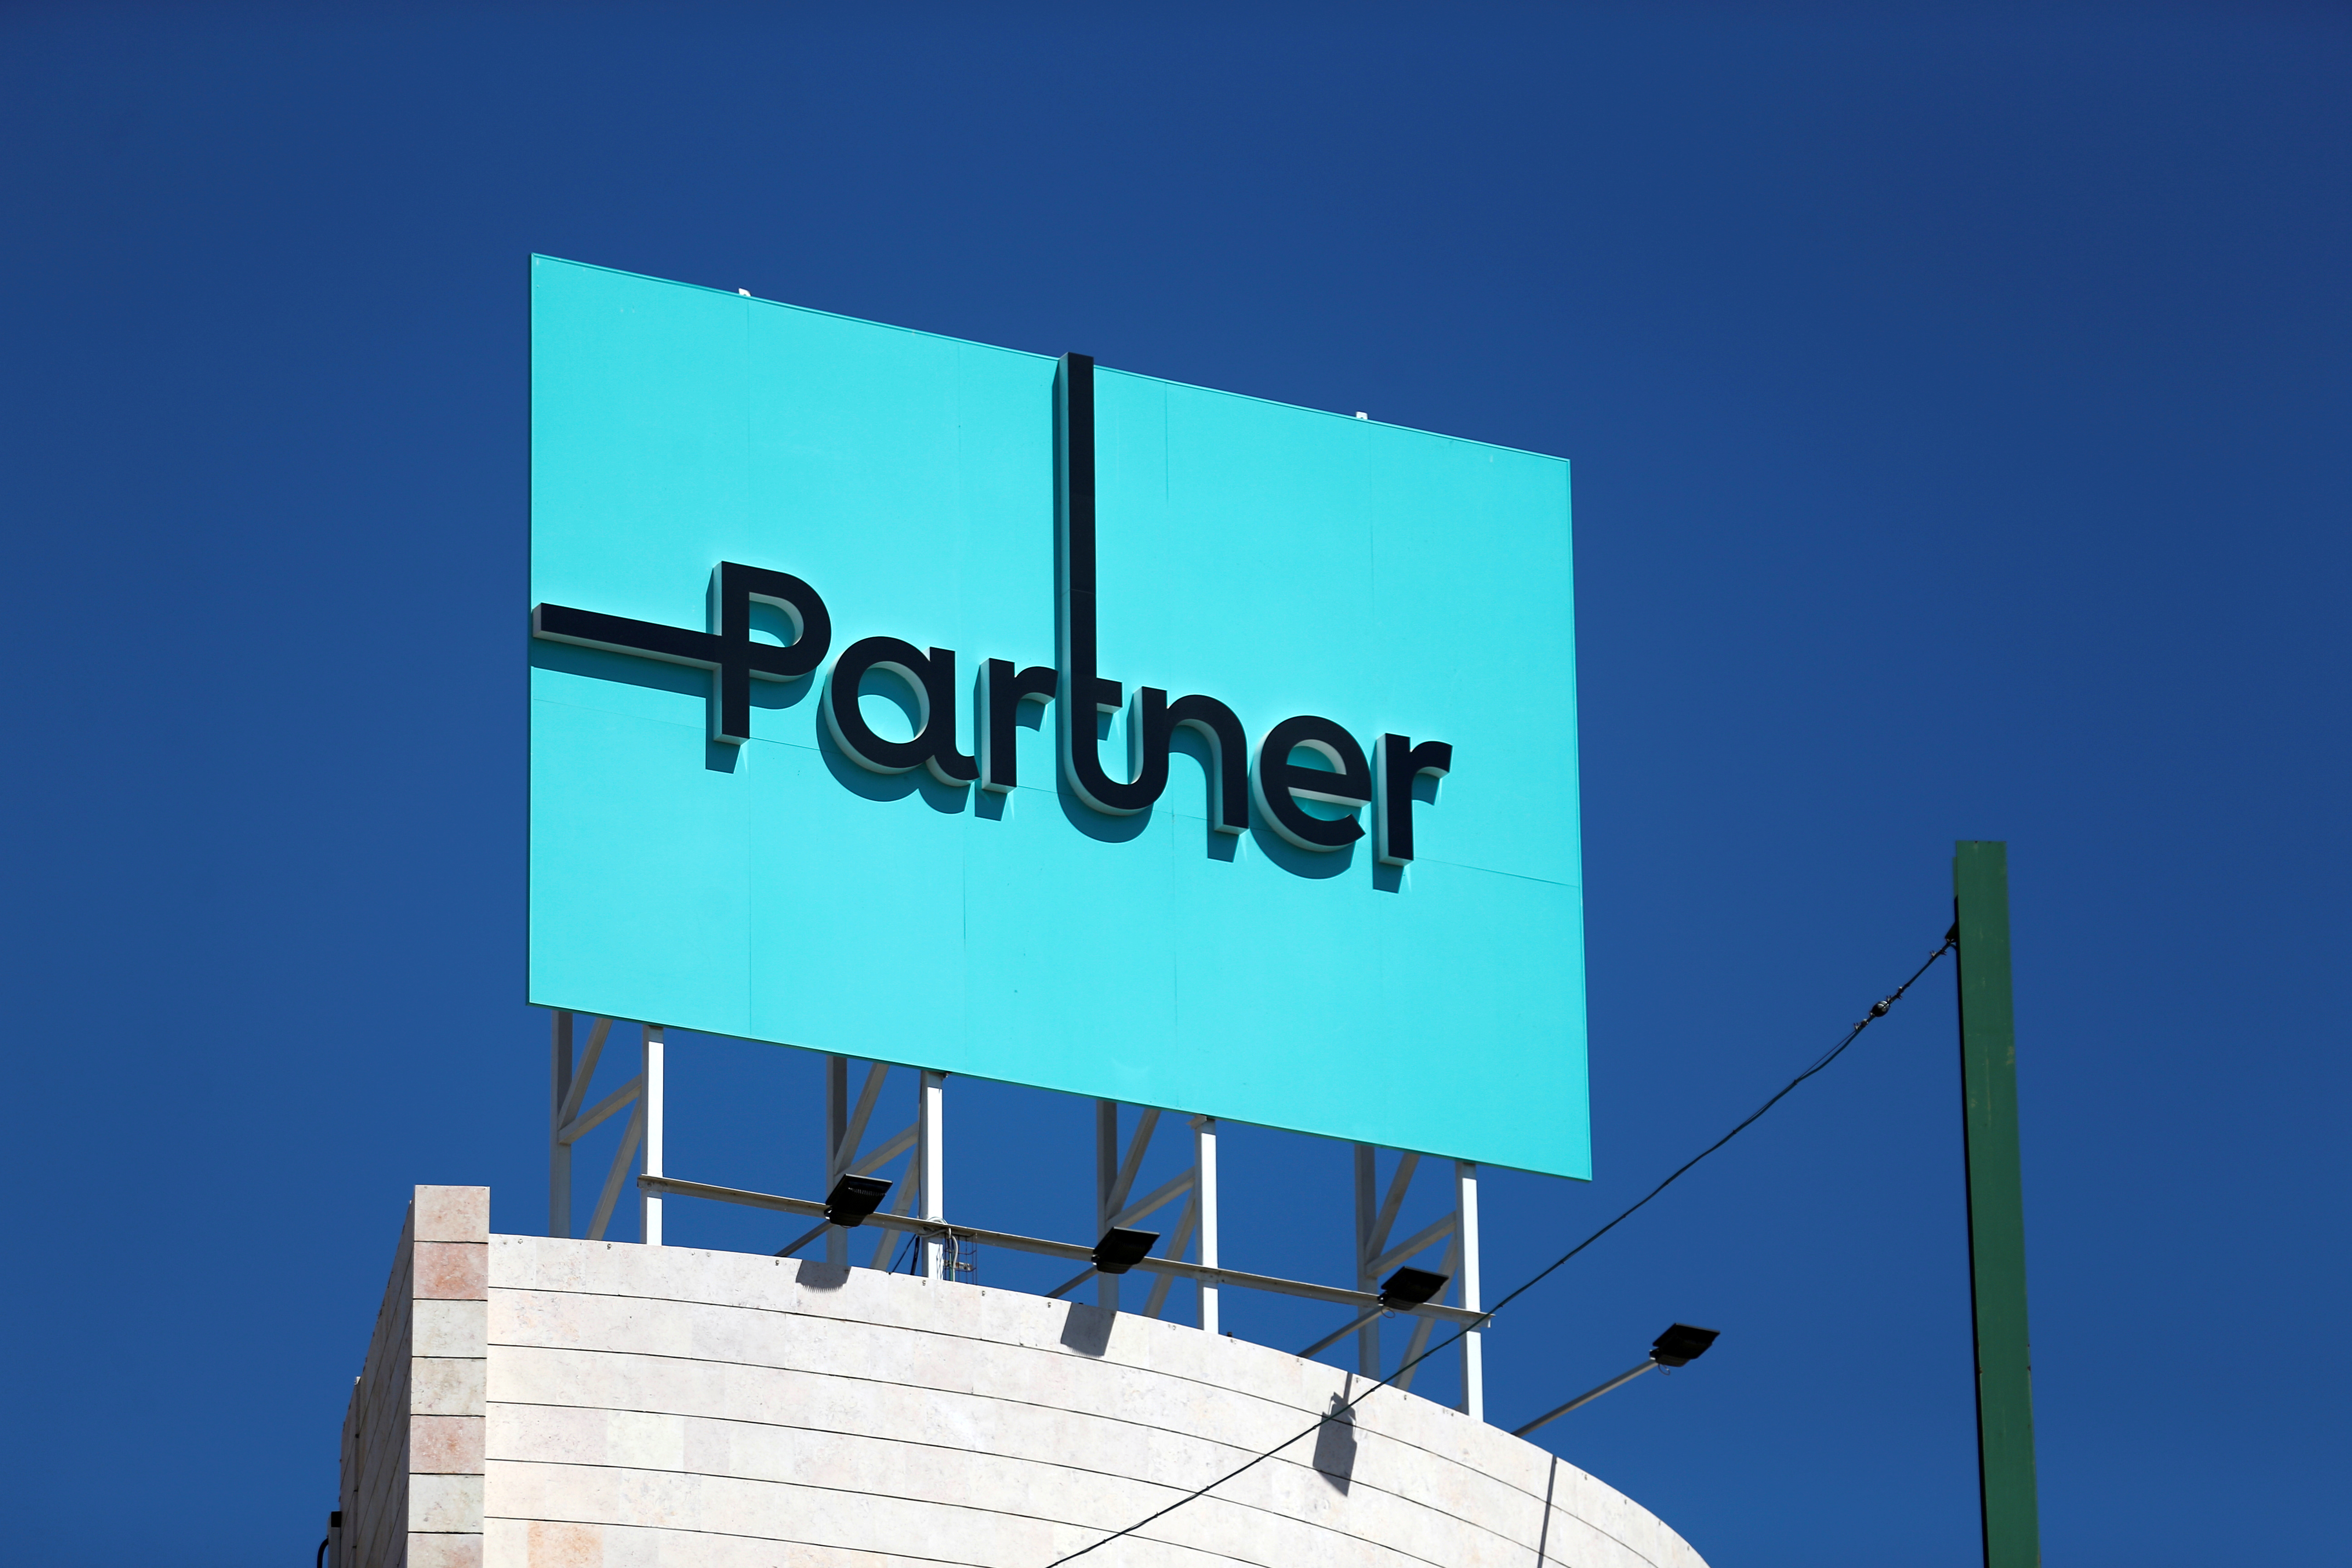 The logo of Partner, an Israeli communication firm, is seen on their headquarters in Rosh Ha'ayin near Tel Aviv, Israel June 21, 2016. REUTERS/Amir Cohen